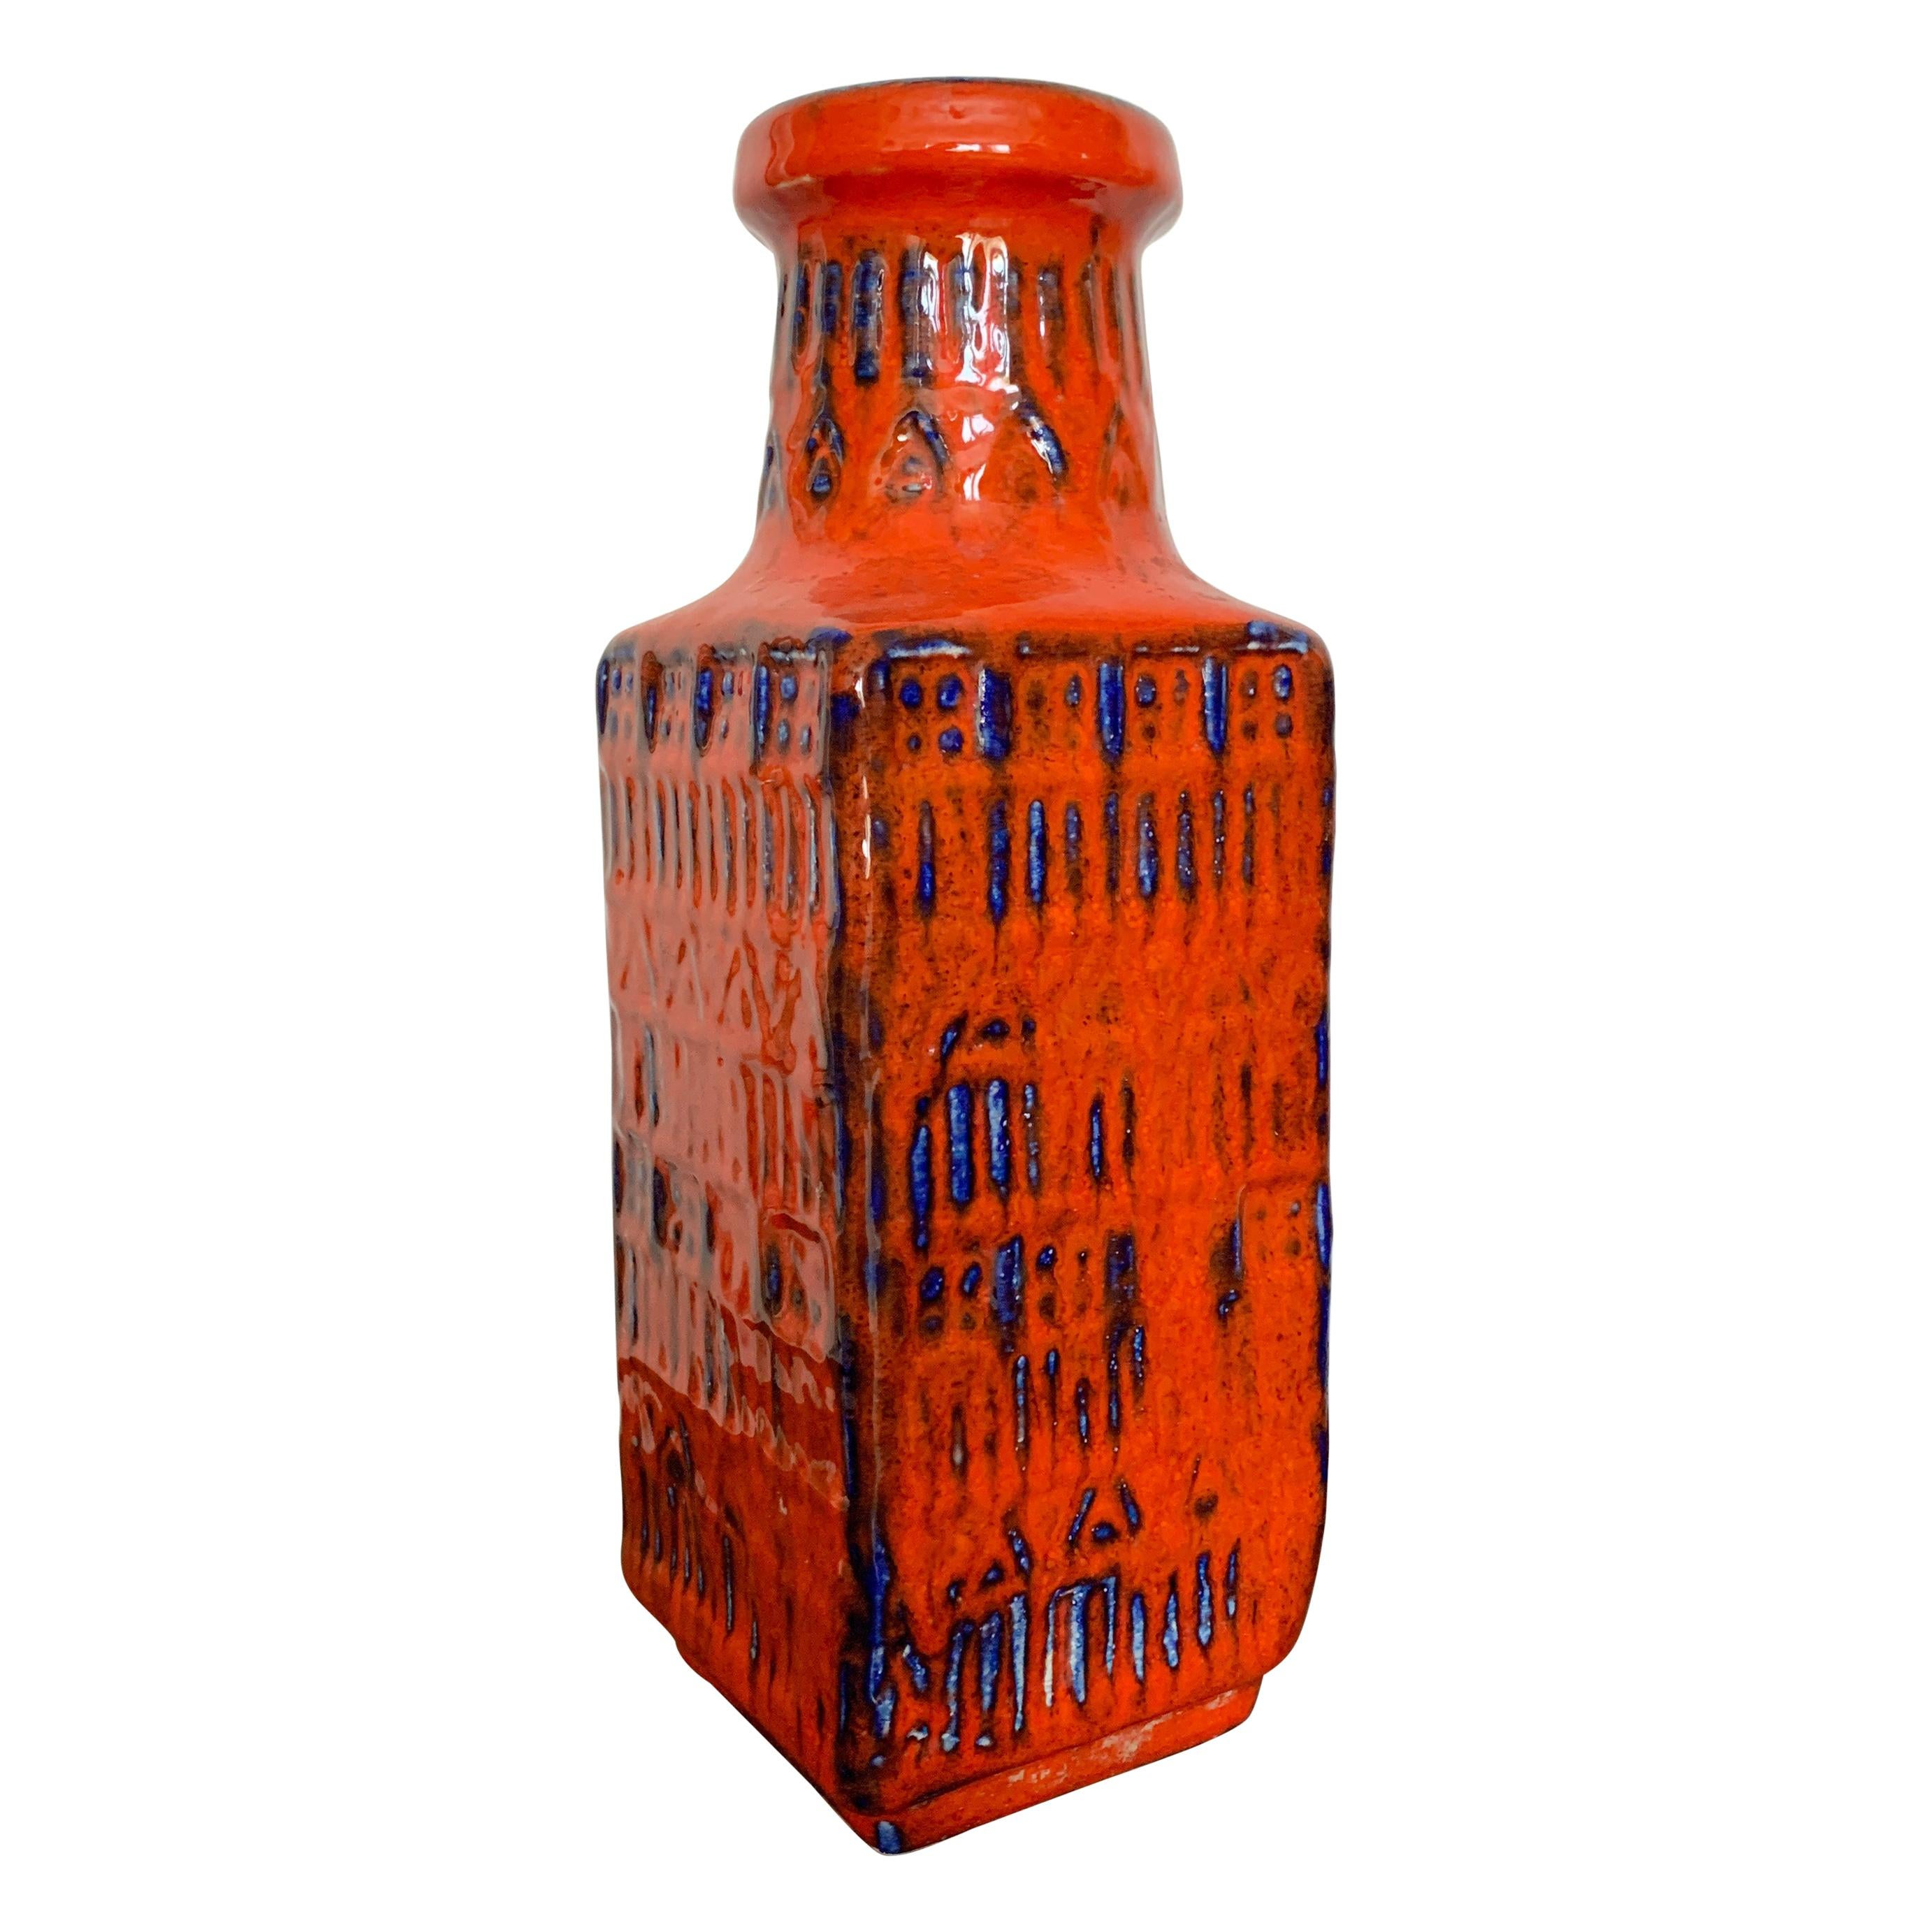 Midcentury Bay Keramik Vase, West Germany